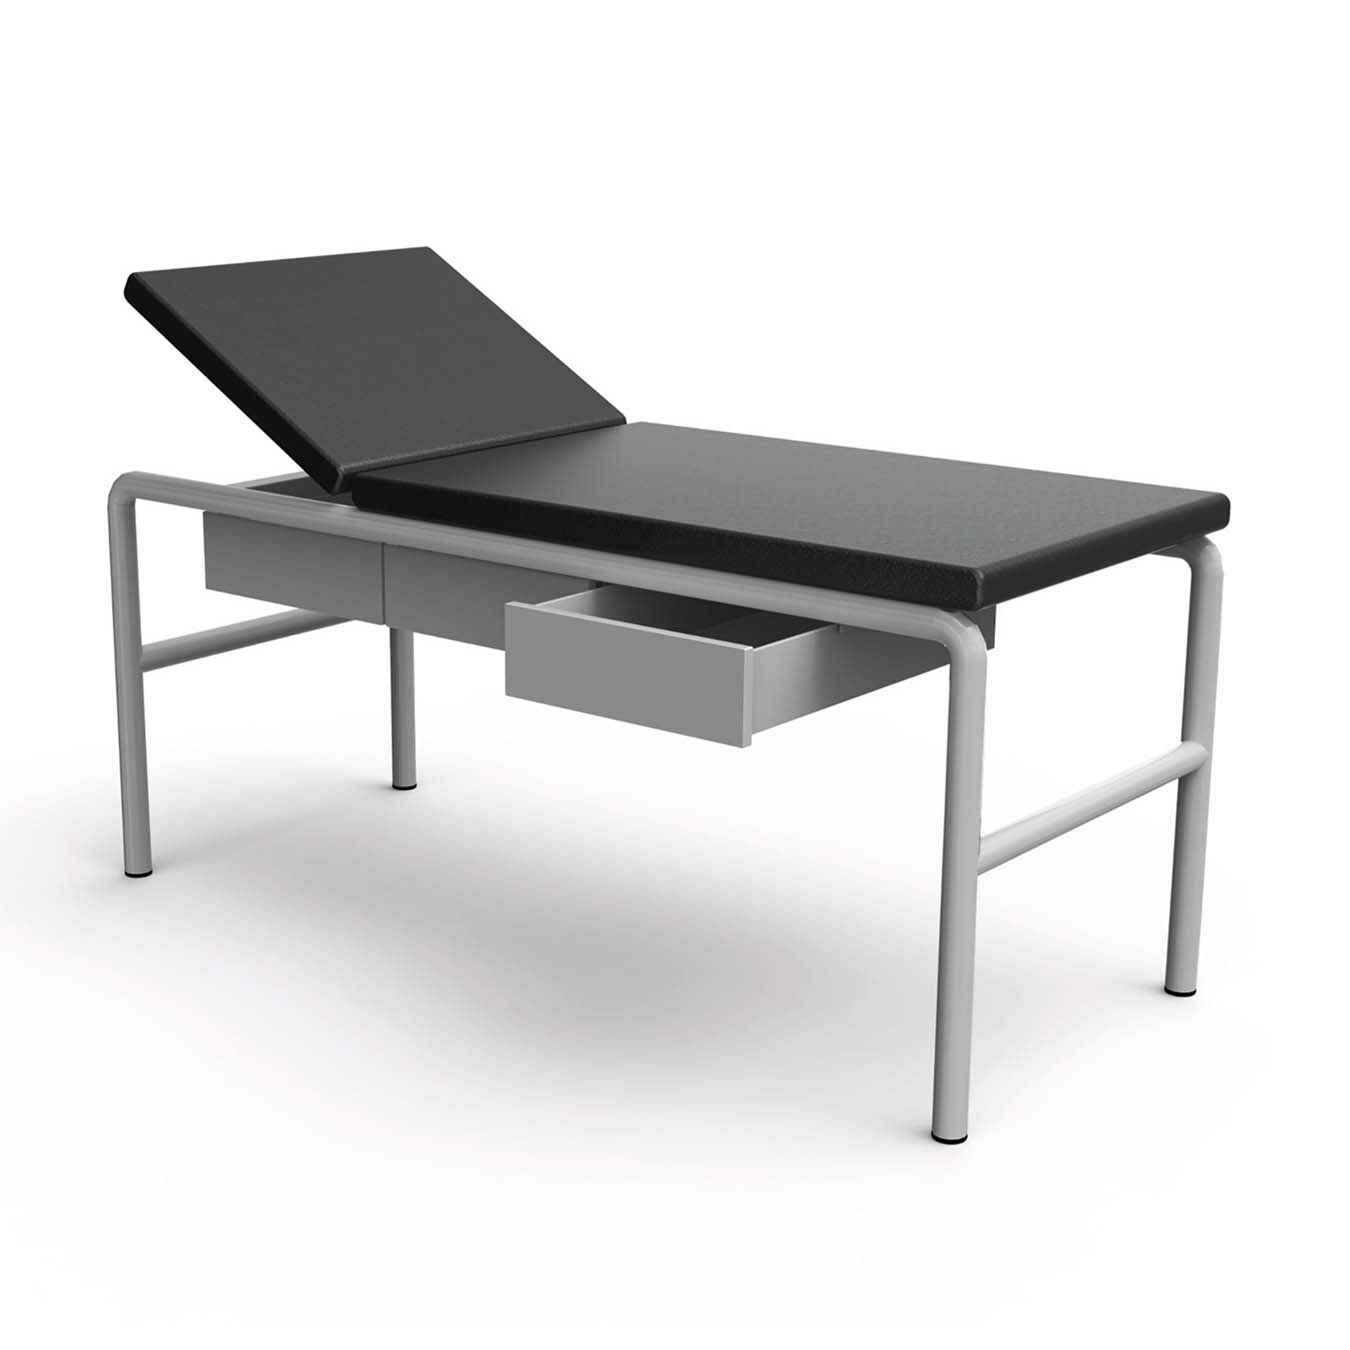 AX382_1_Examination-Couch-Heavy-Duty-3-Drawer-Unit_1